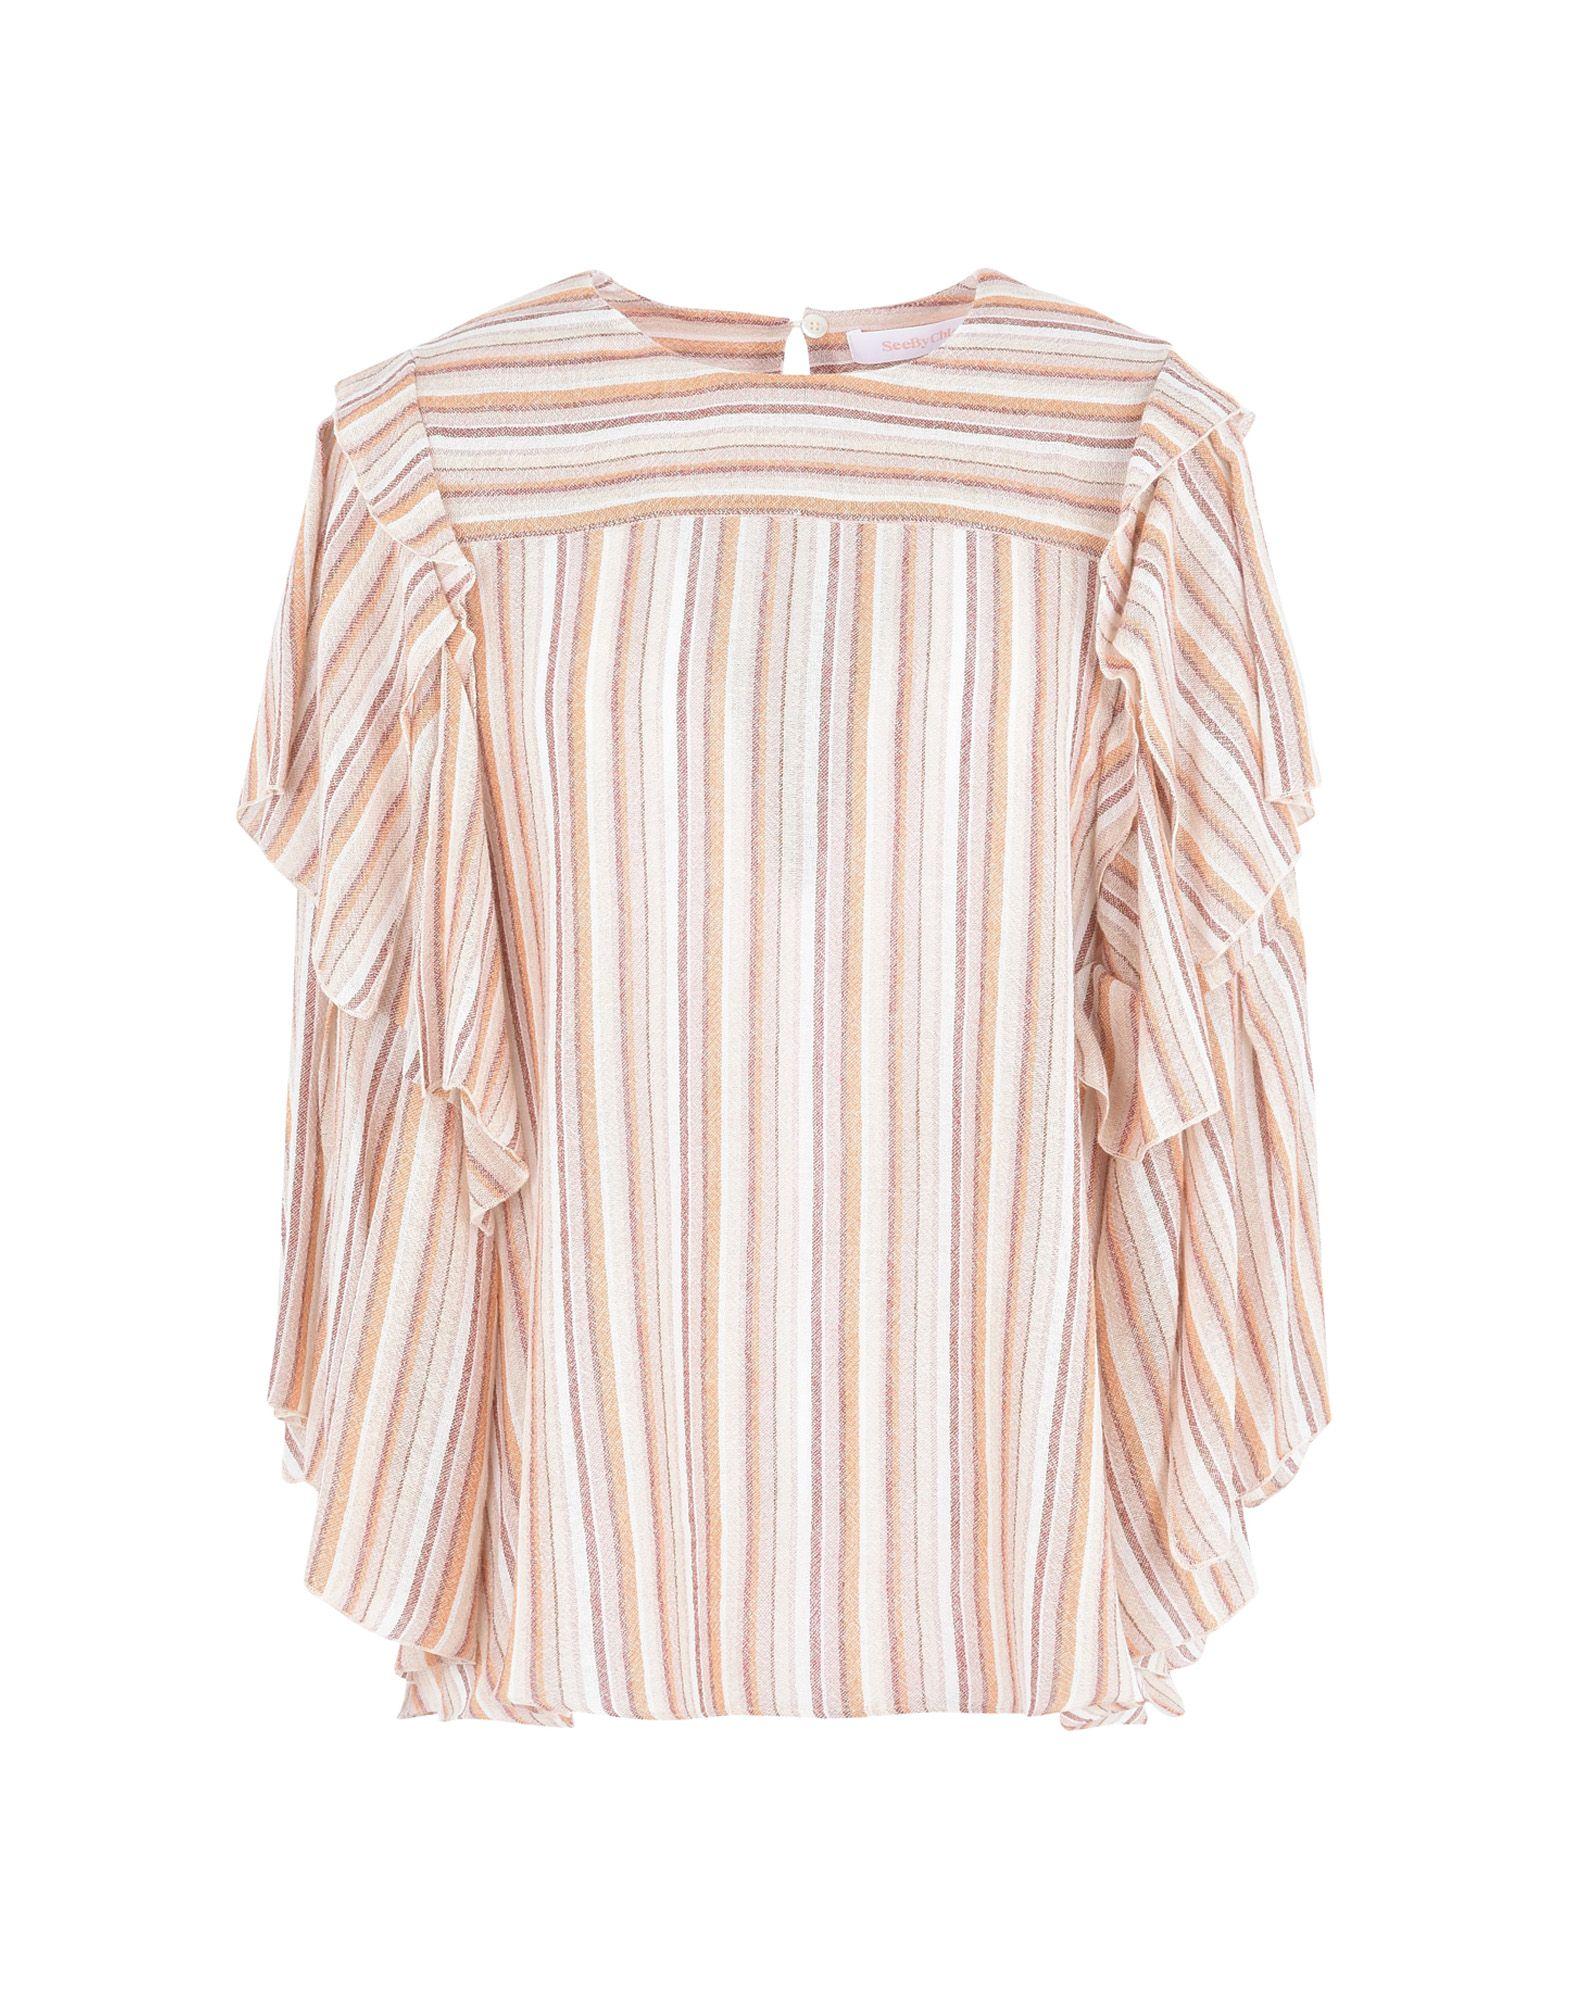 SEE BY CHLOÉ Pубашка see by chloé шерстяное платье в полоску